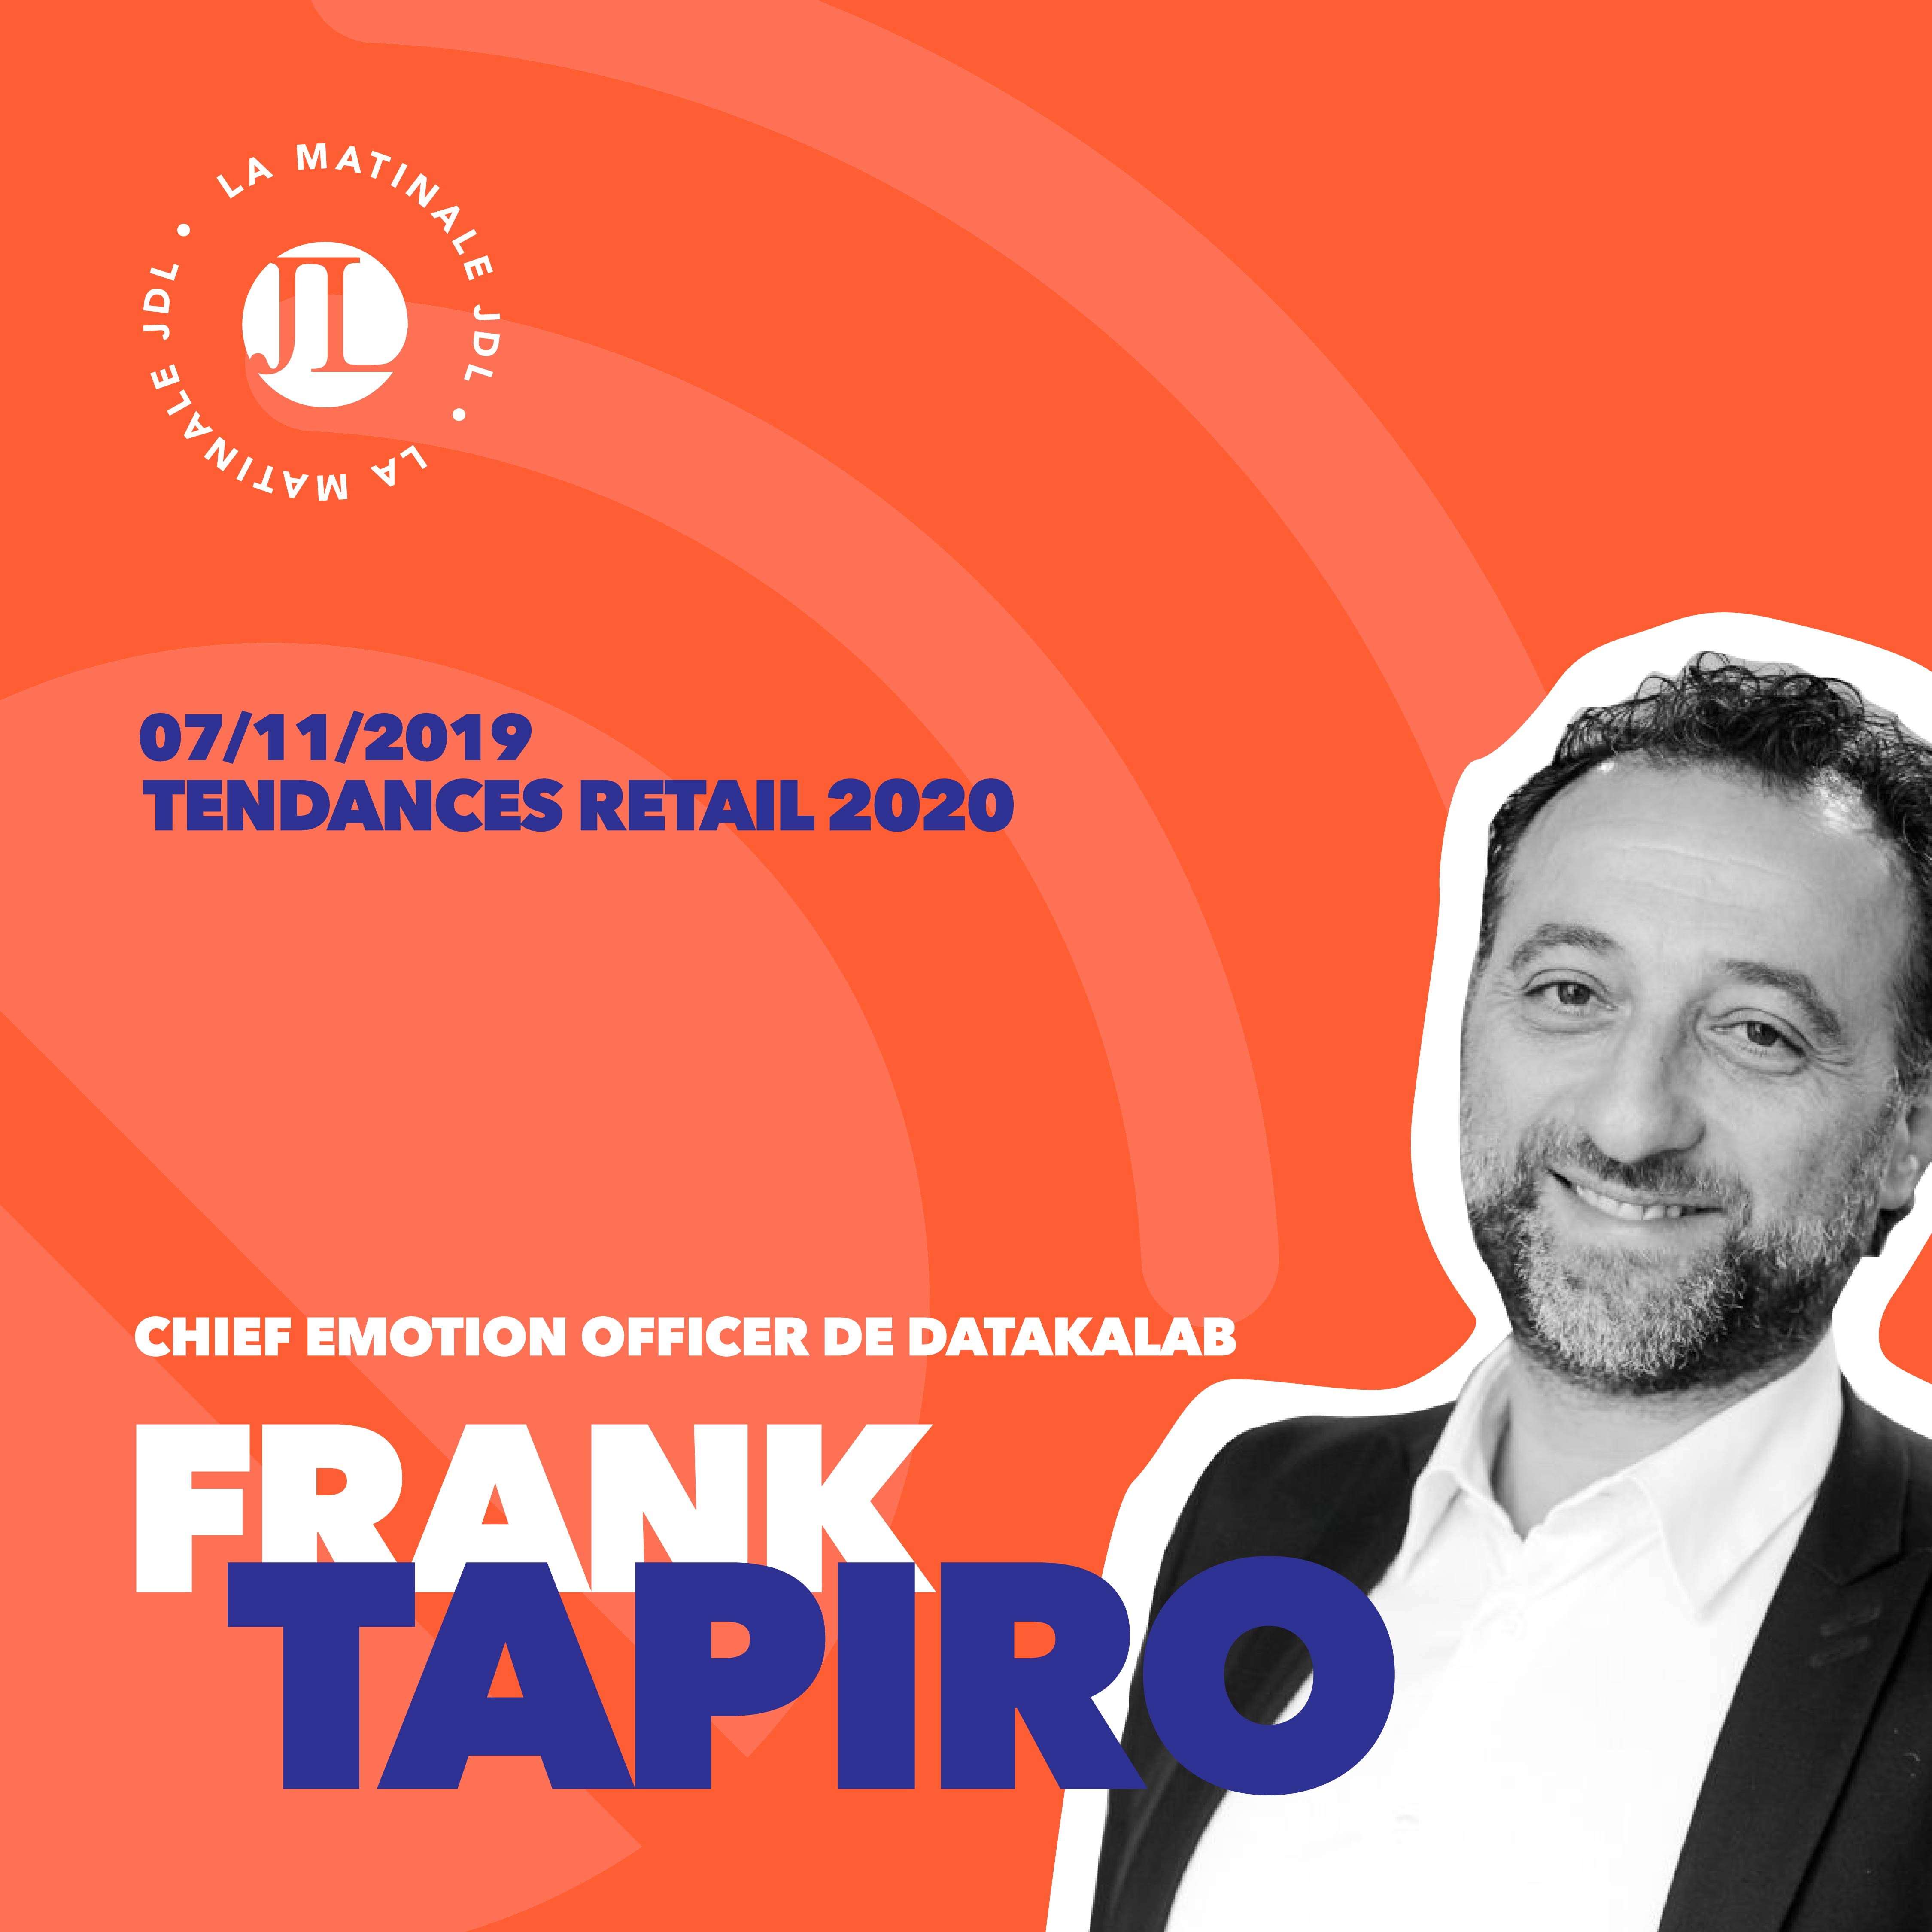 Frank Tapiro